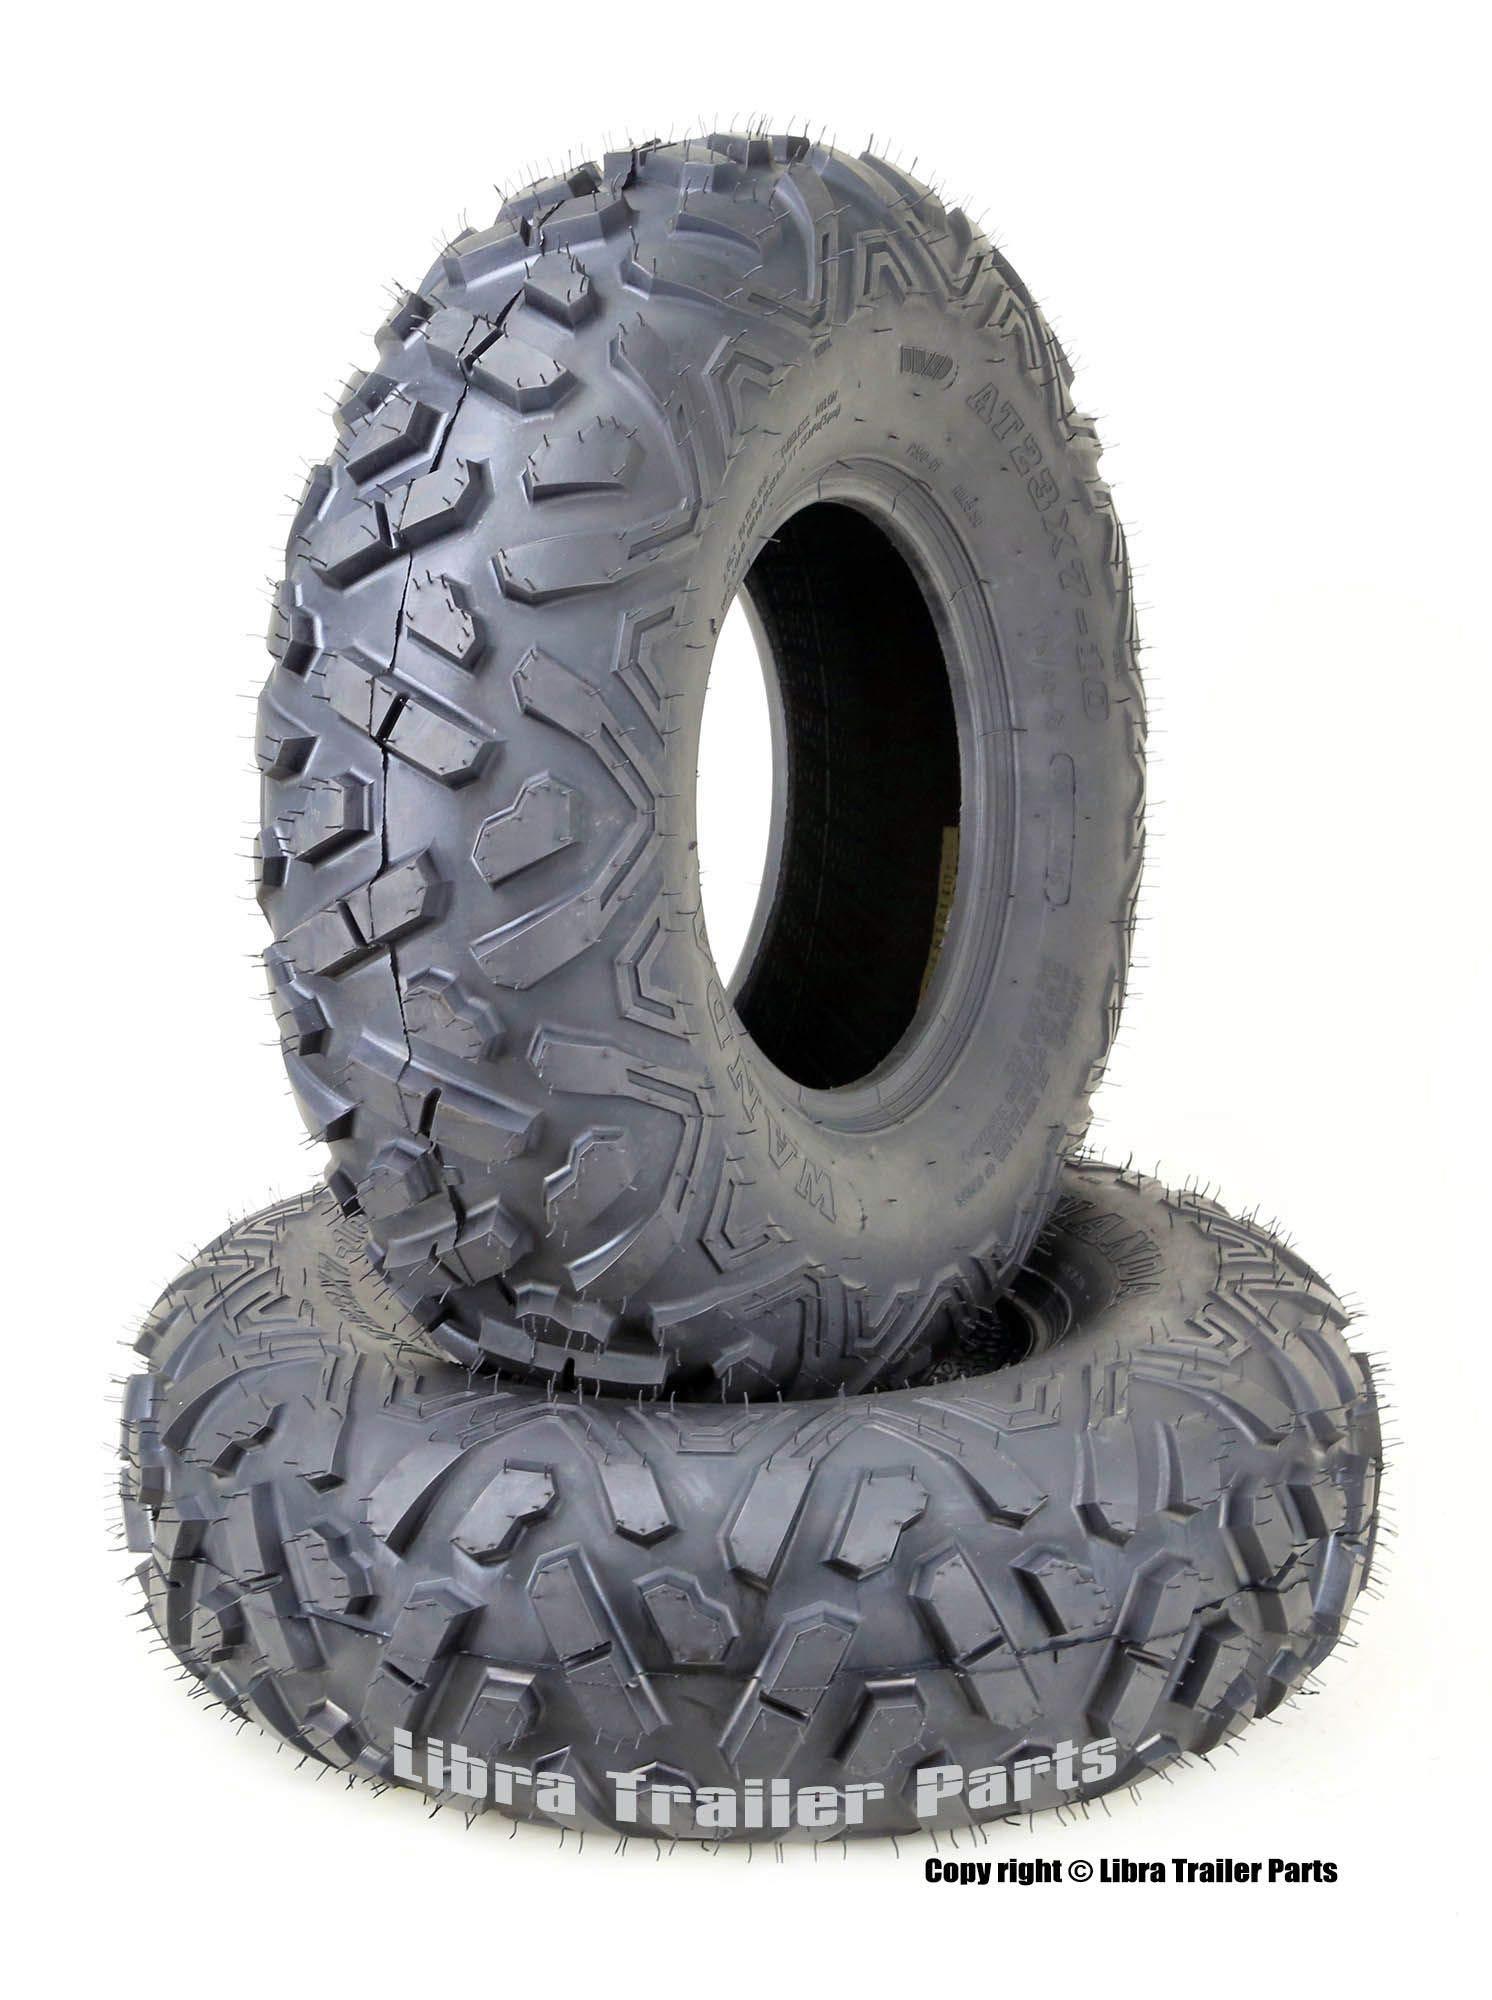 Set of 2 WANDA ATV Tires 23x7-10 23x7x10 4PR Big Horn Style by WANDA